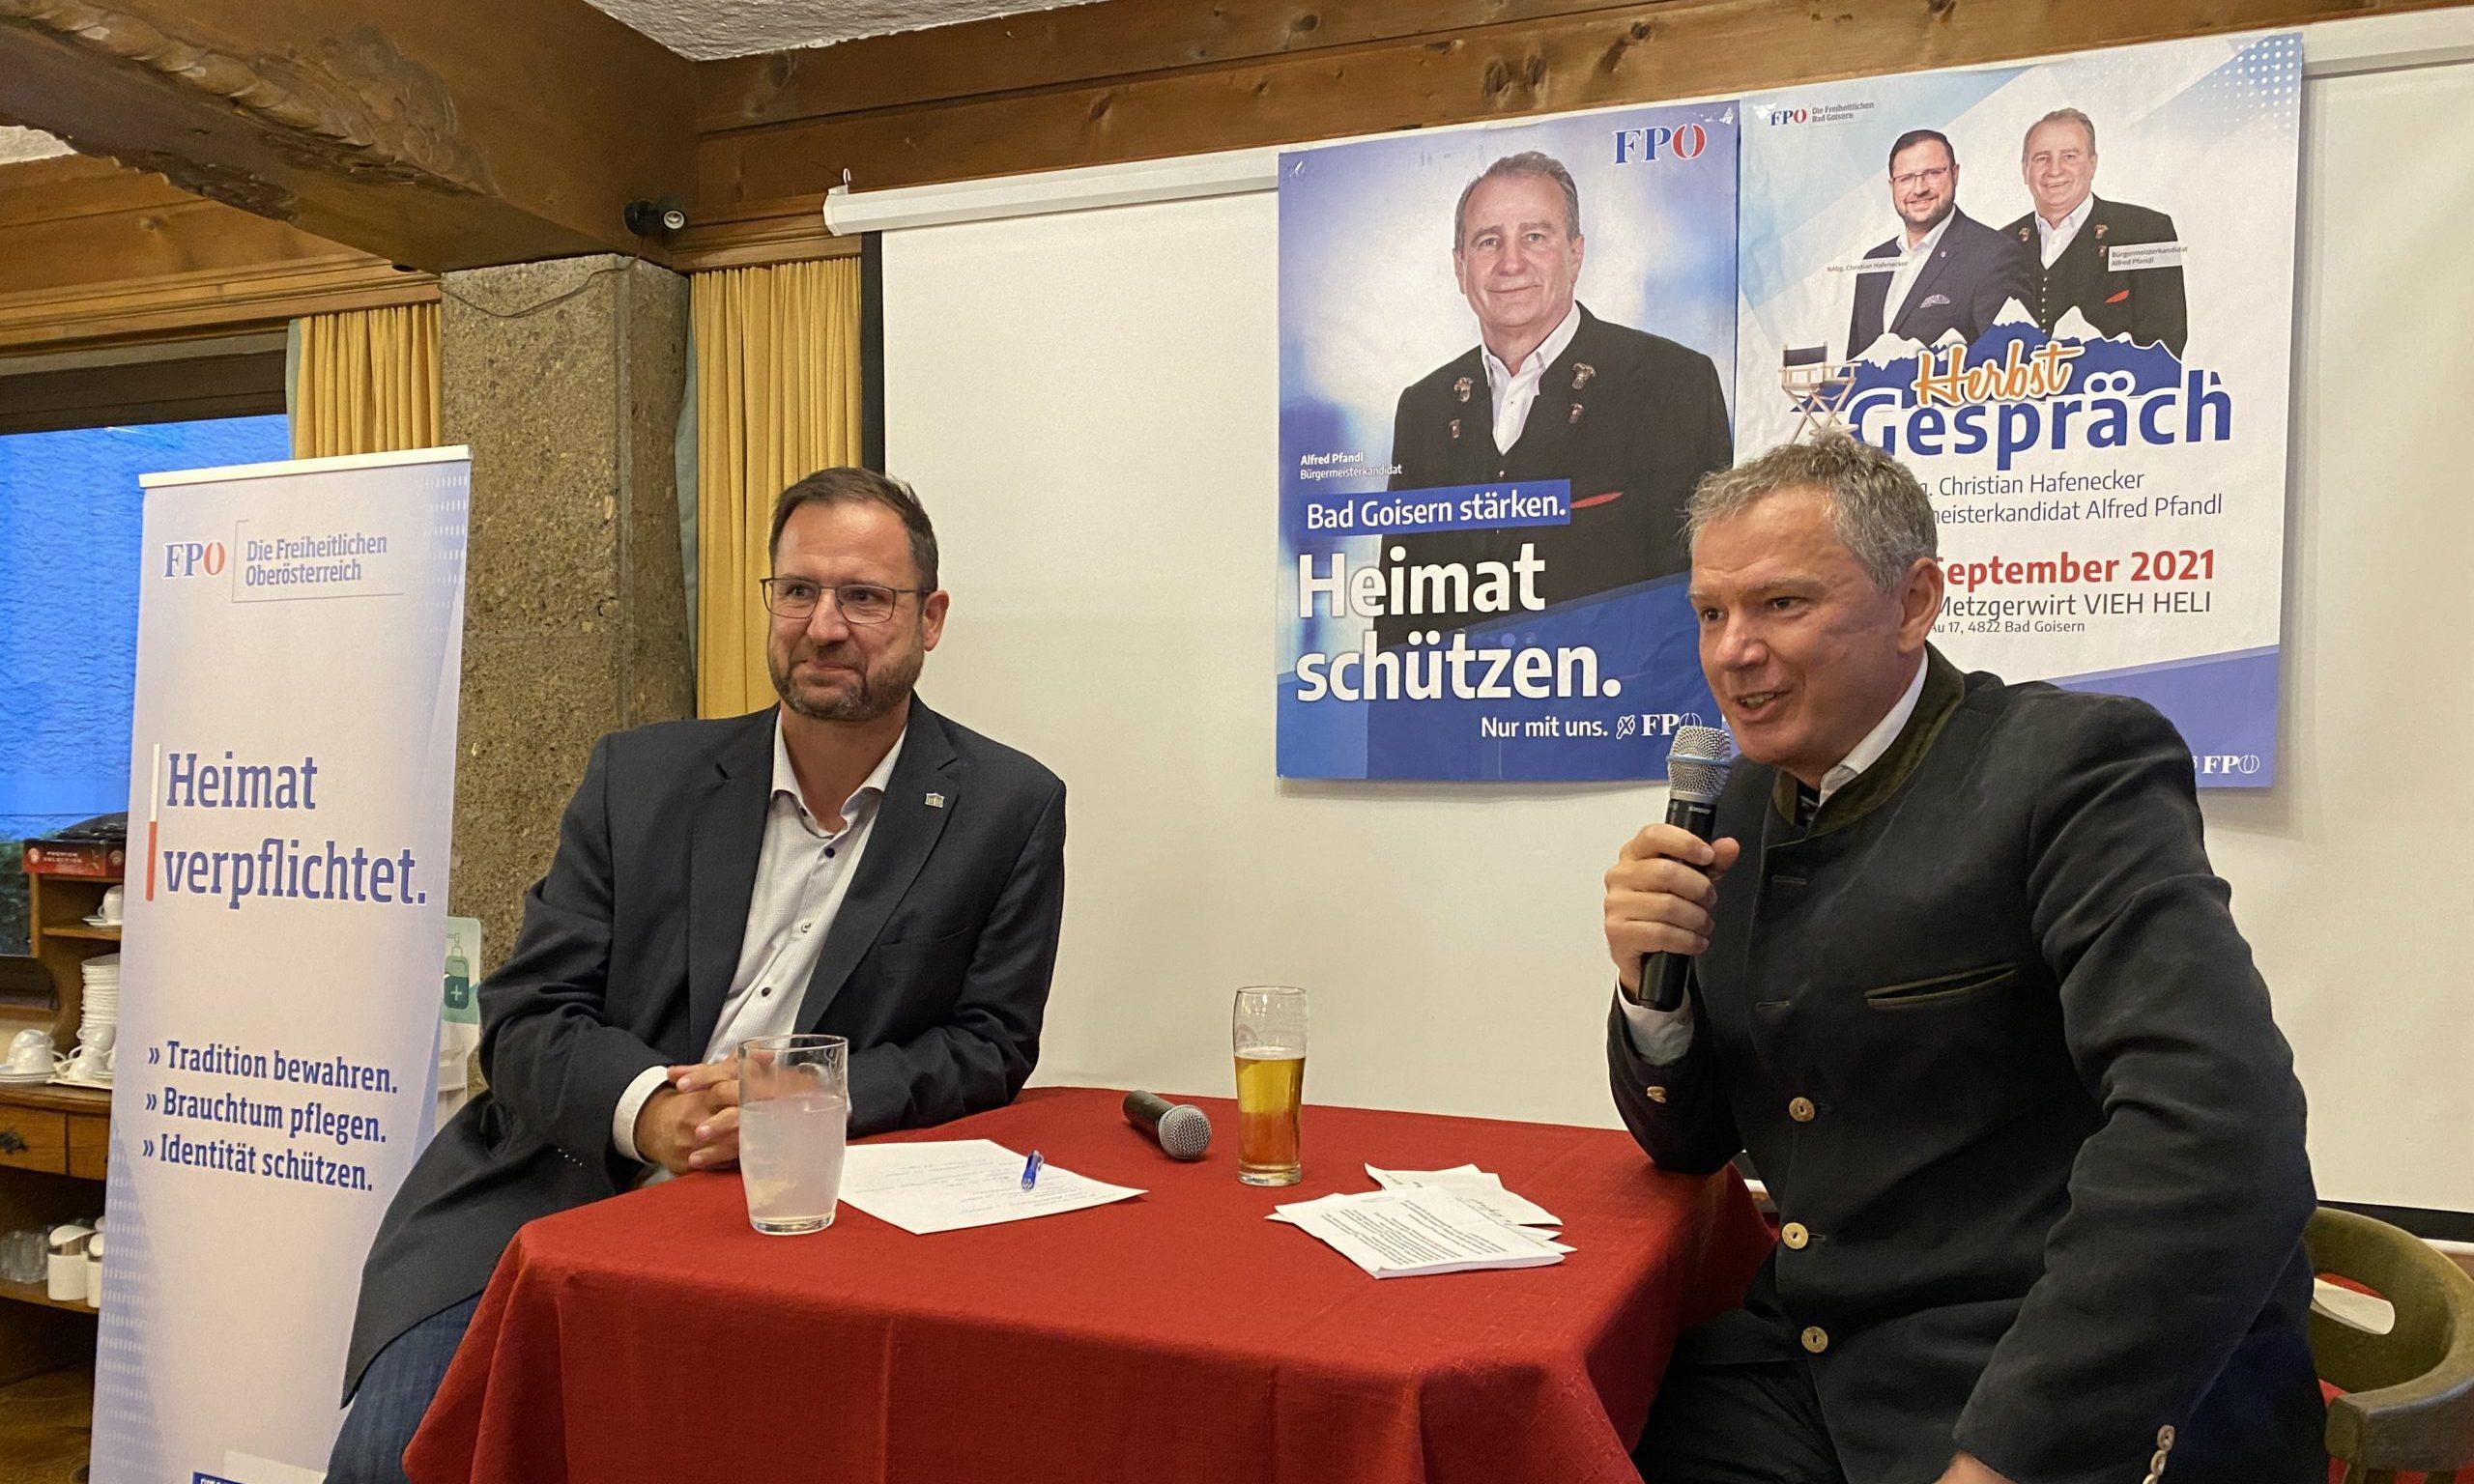 Walter Asperl / Christian Hafenecker